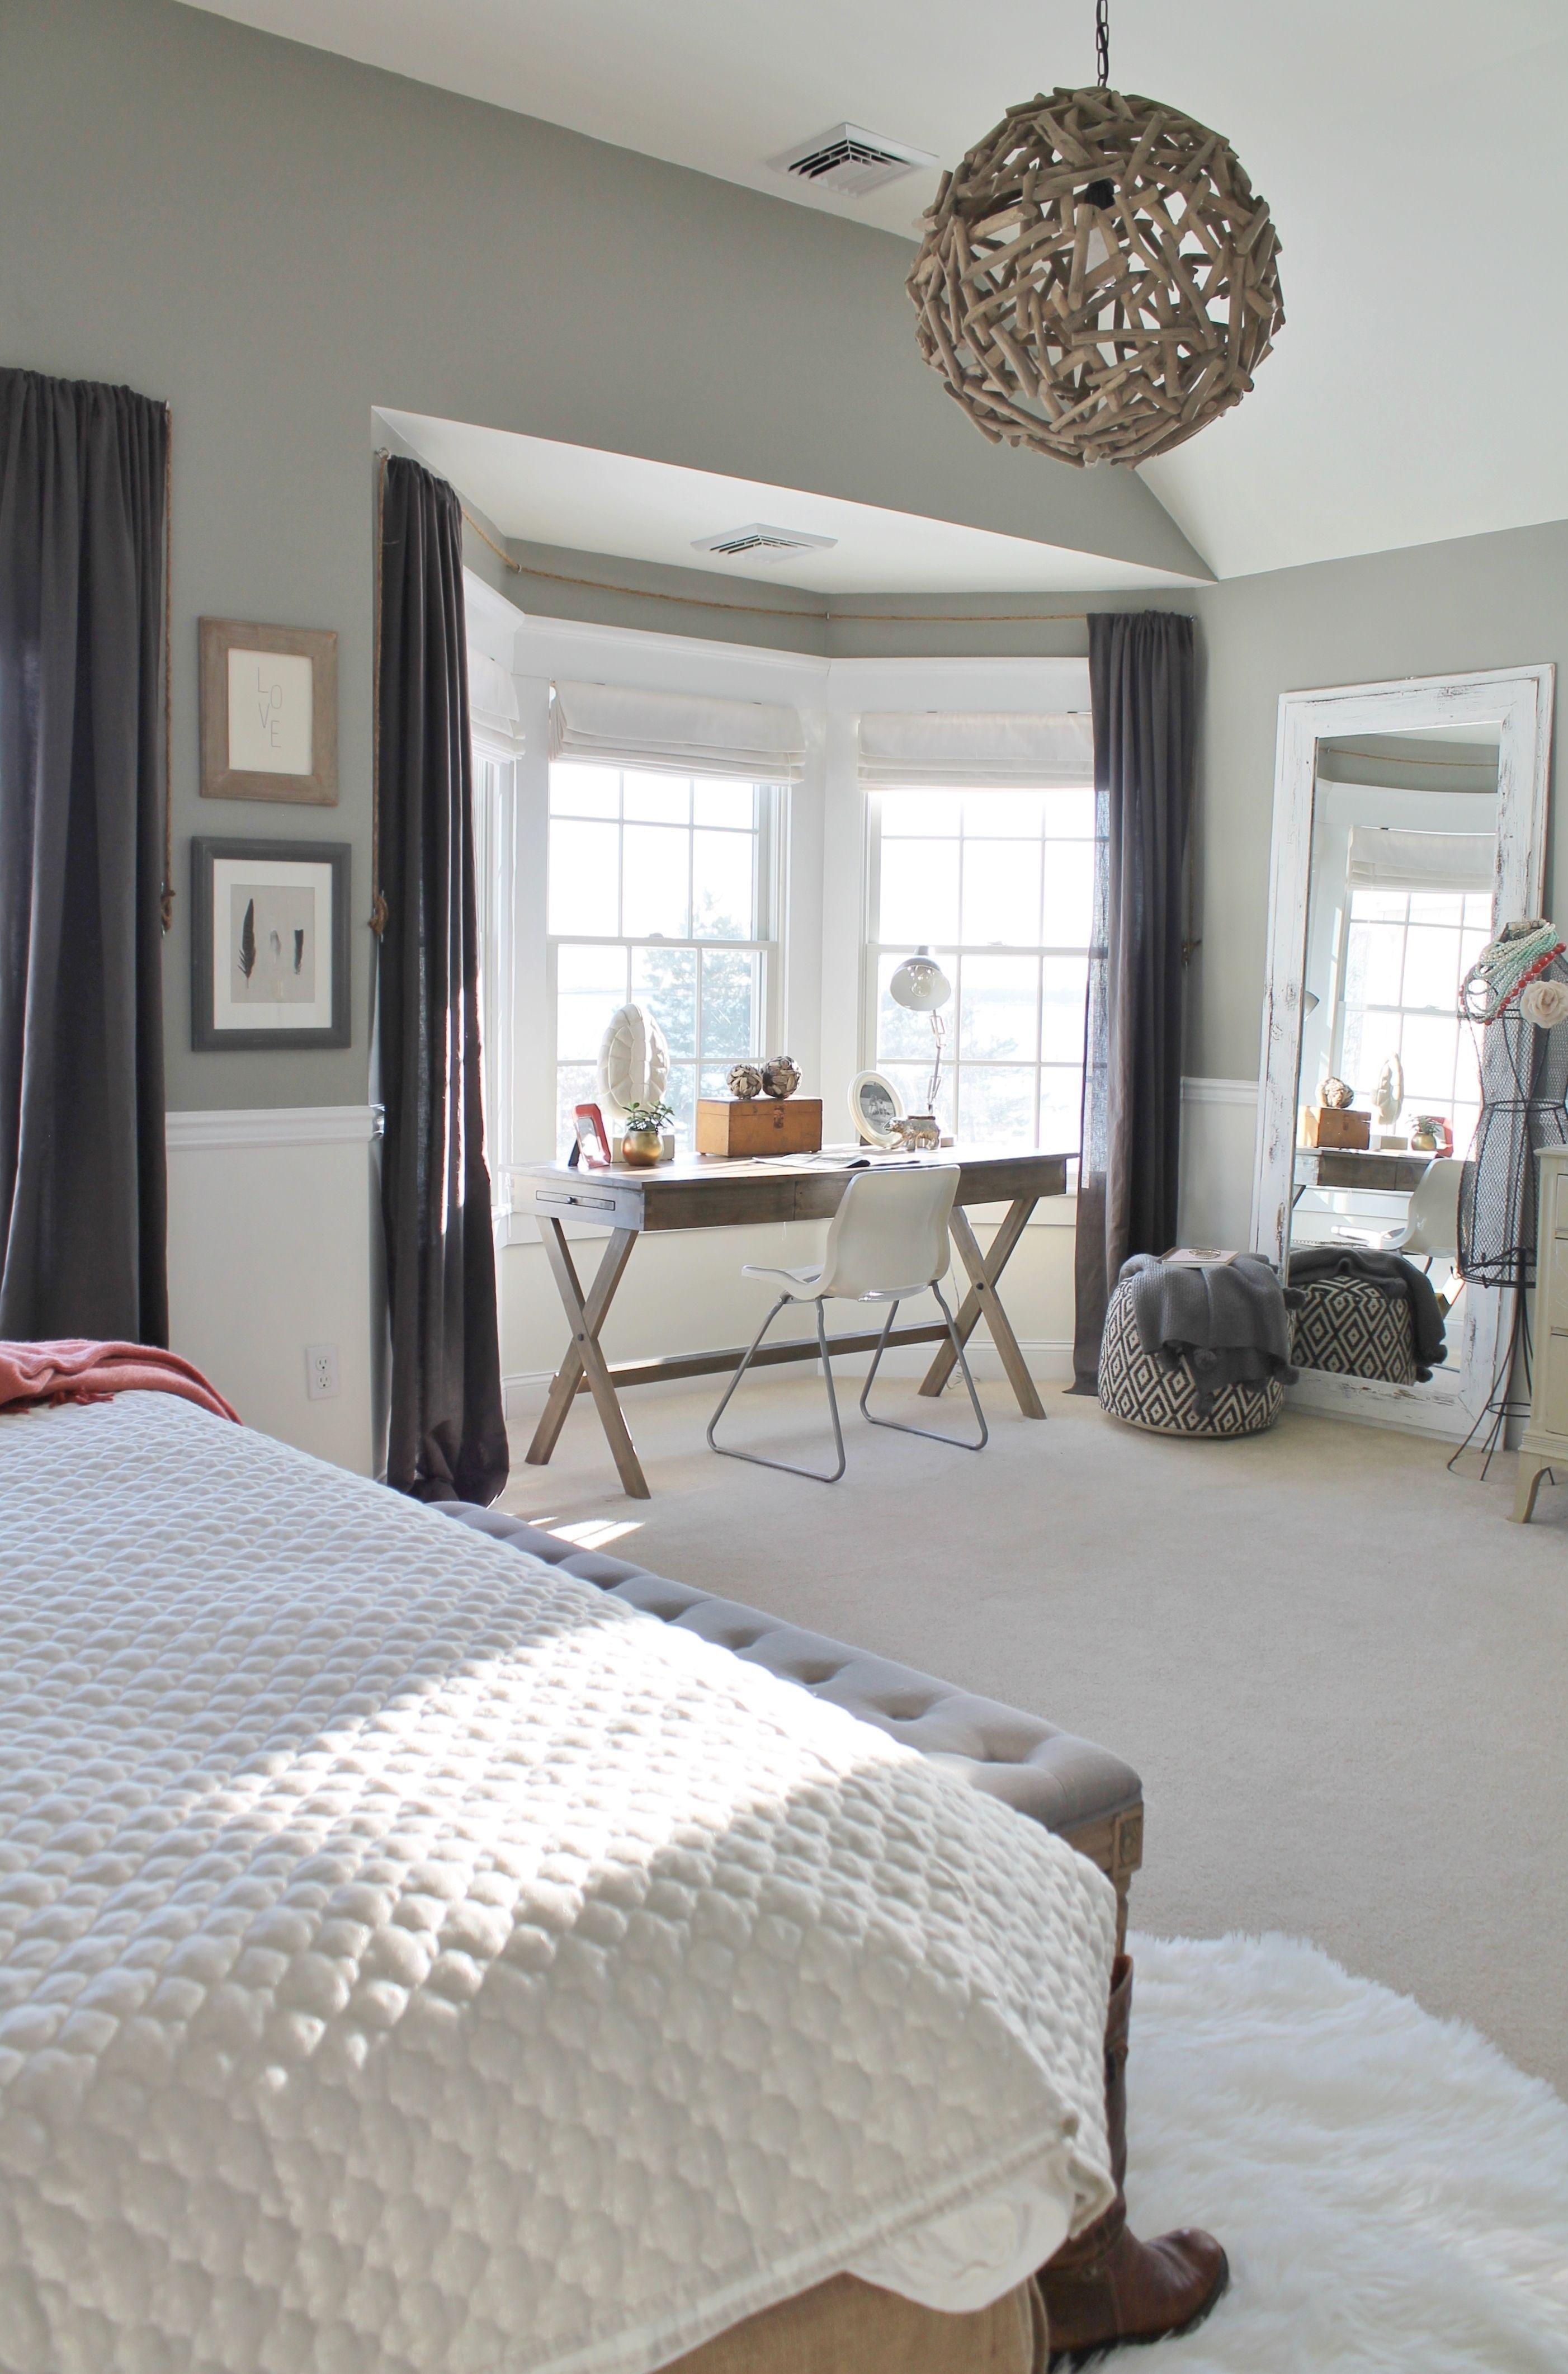 Adorable Desk In Master Bedroom , Fresh Desk In Master Bedroom 8